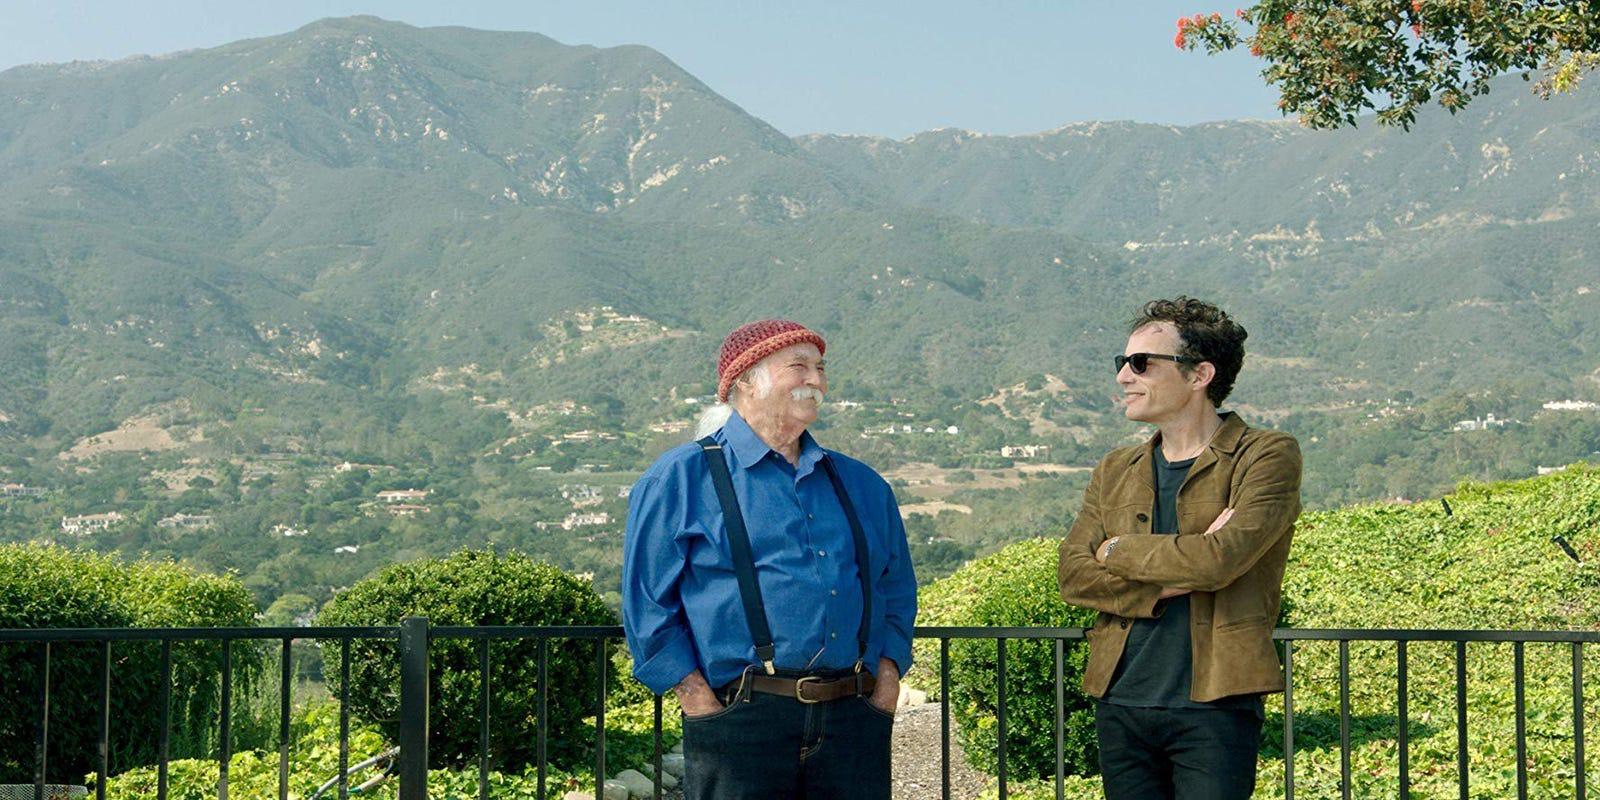 Doc fondly recalls Laurel Canyon music scene